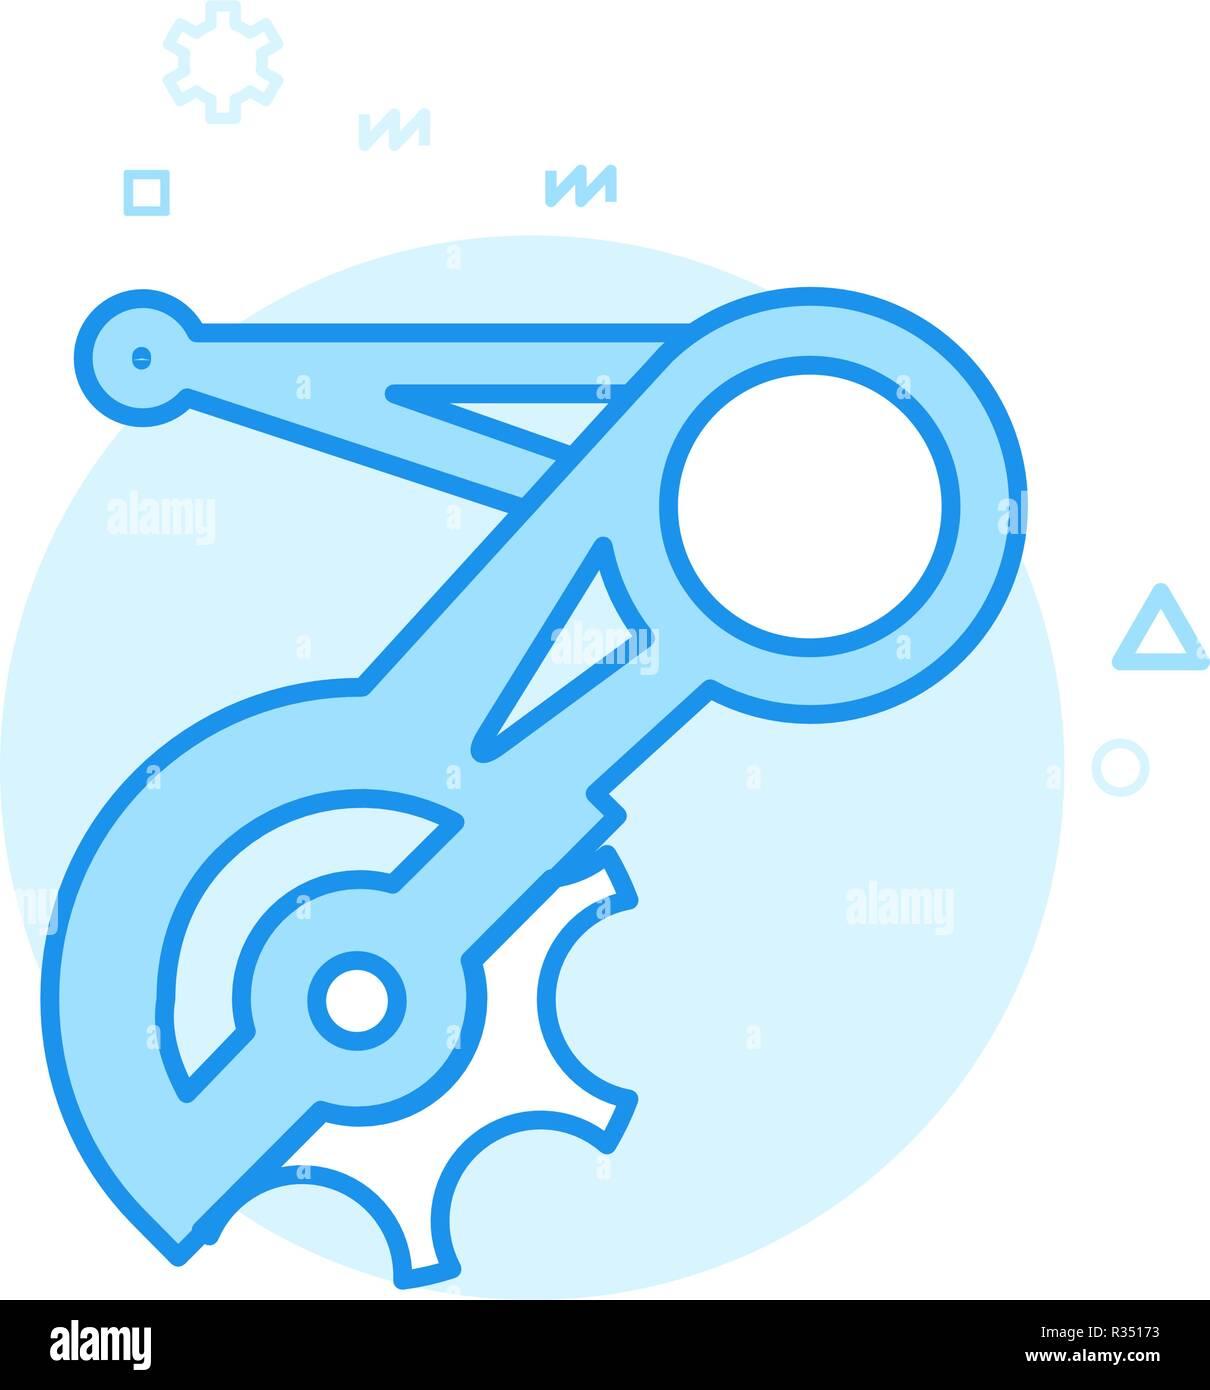 Bike or Bicycle Rear Derailleur Flat Vector Icon, Symbol, Pictogram, Sign. Blue Monochrome Design. Editable Stroke - Stock Vector